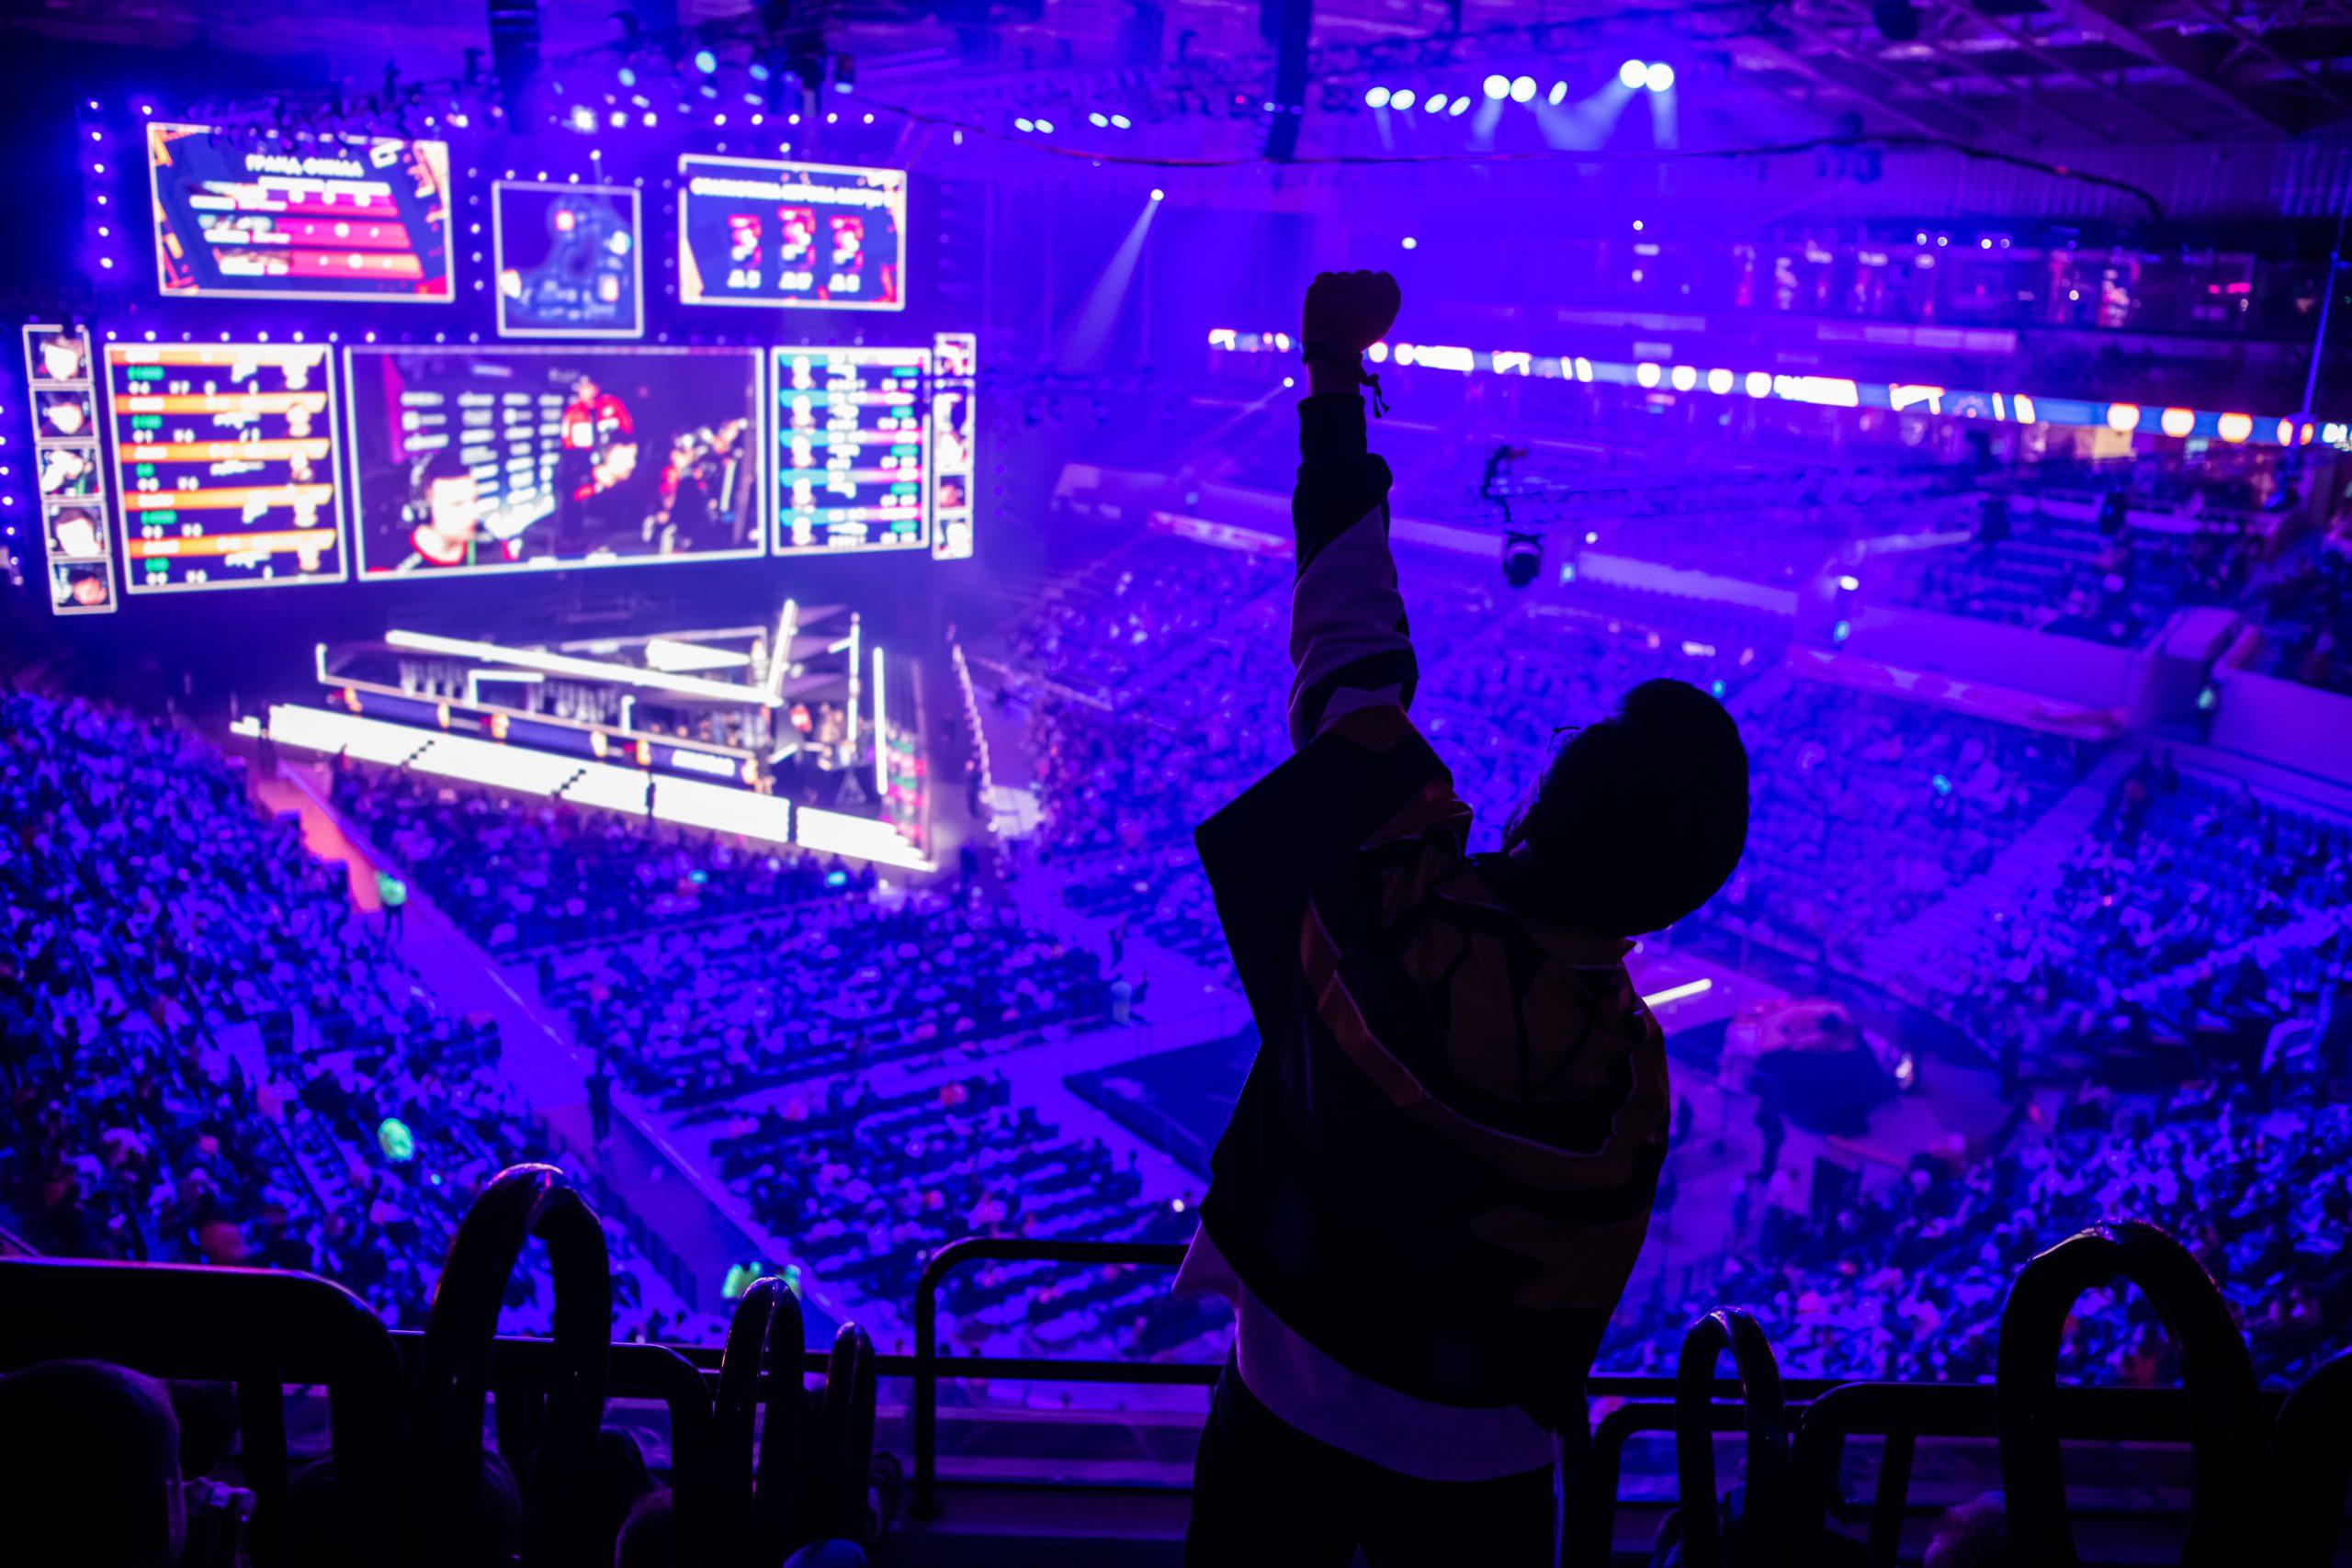 Predicting the unpredictable with esports events